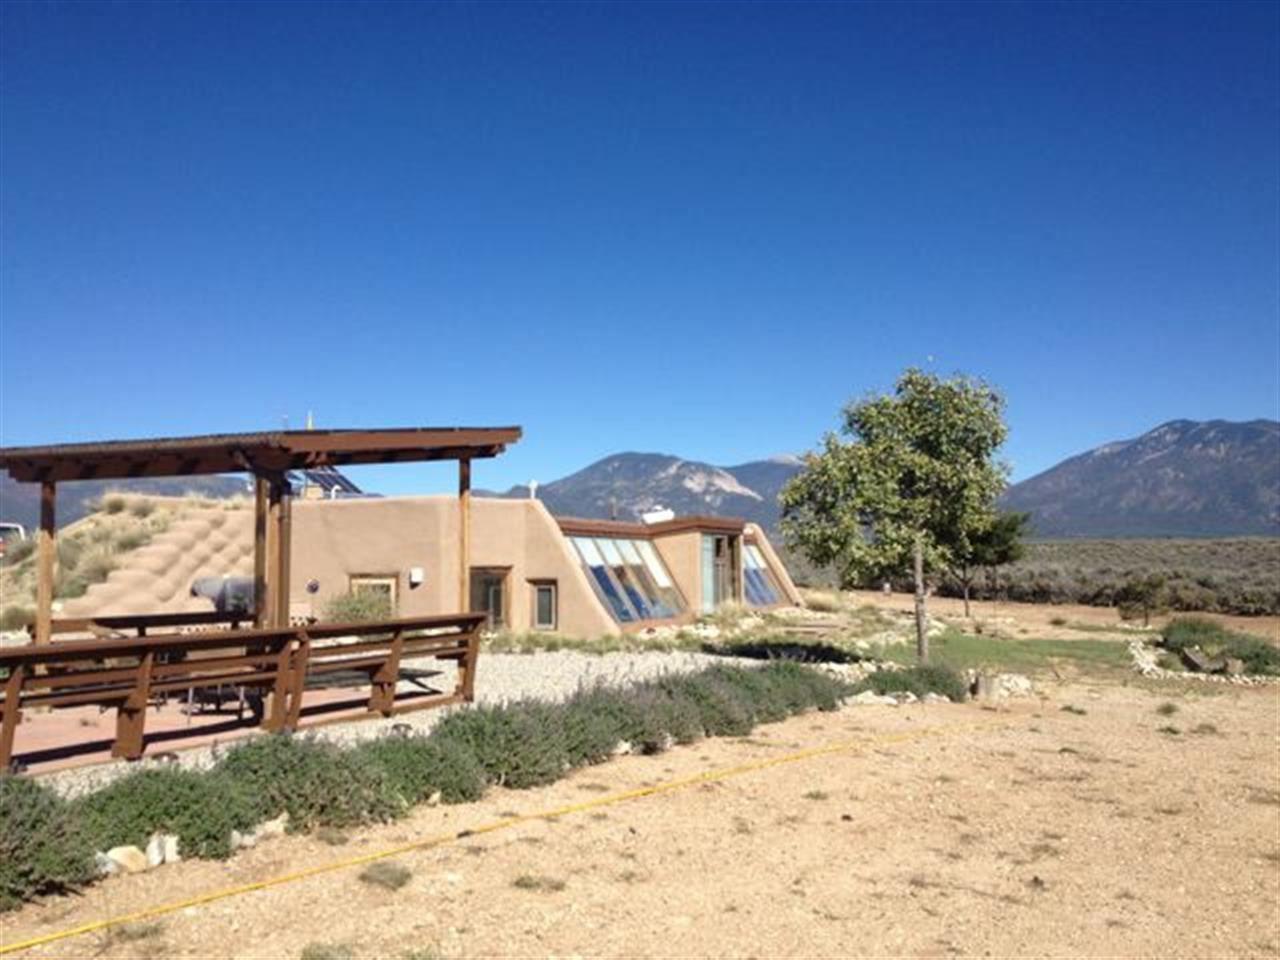 New mexico taos county llano - 265 Mesa Sea Rd